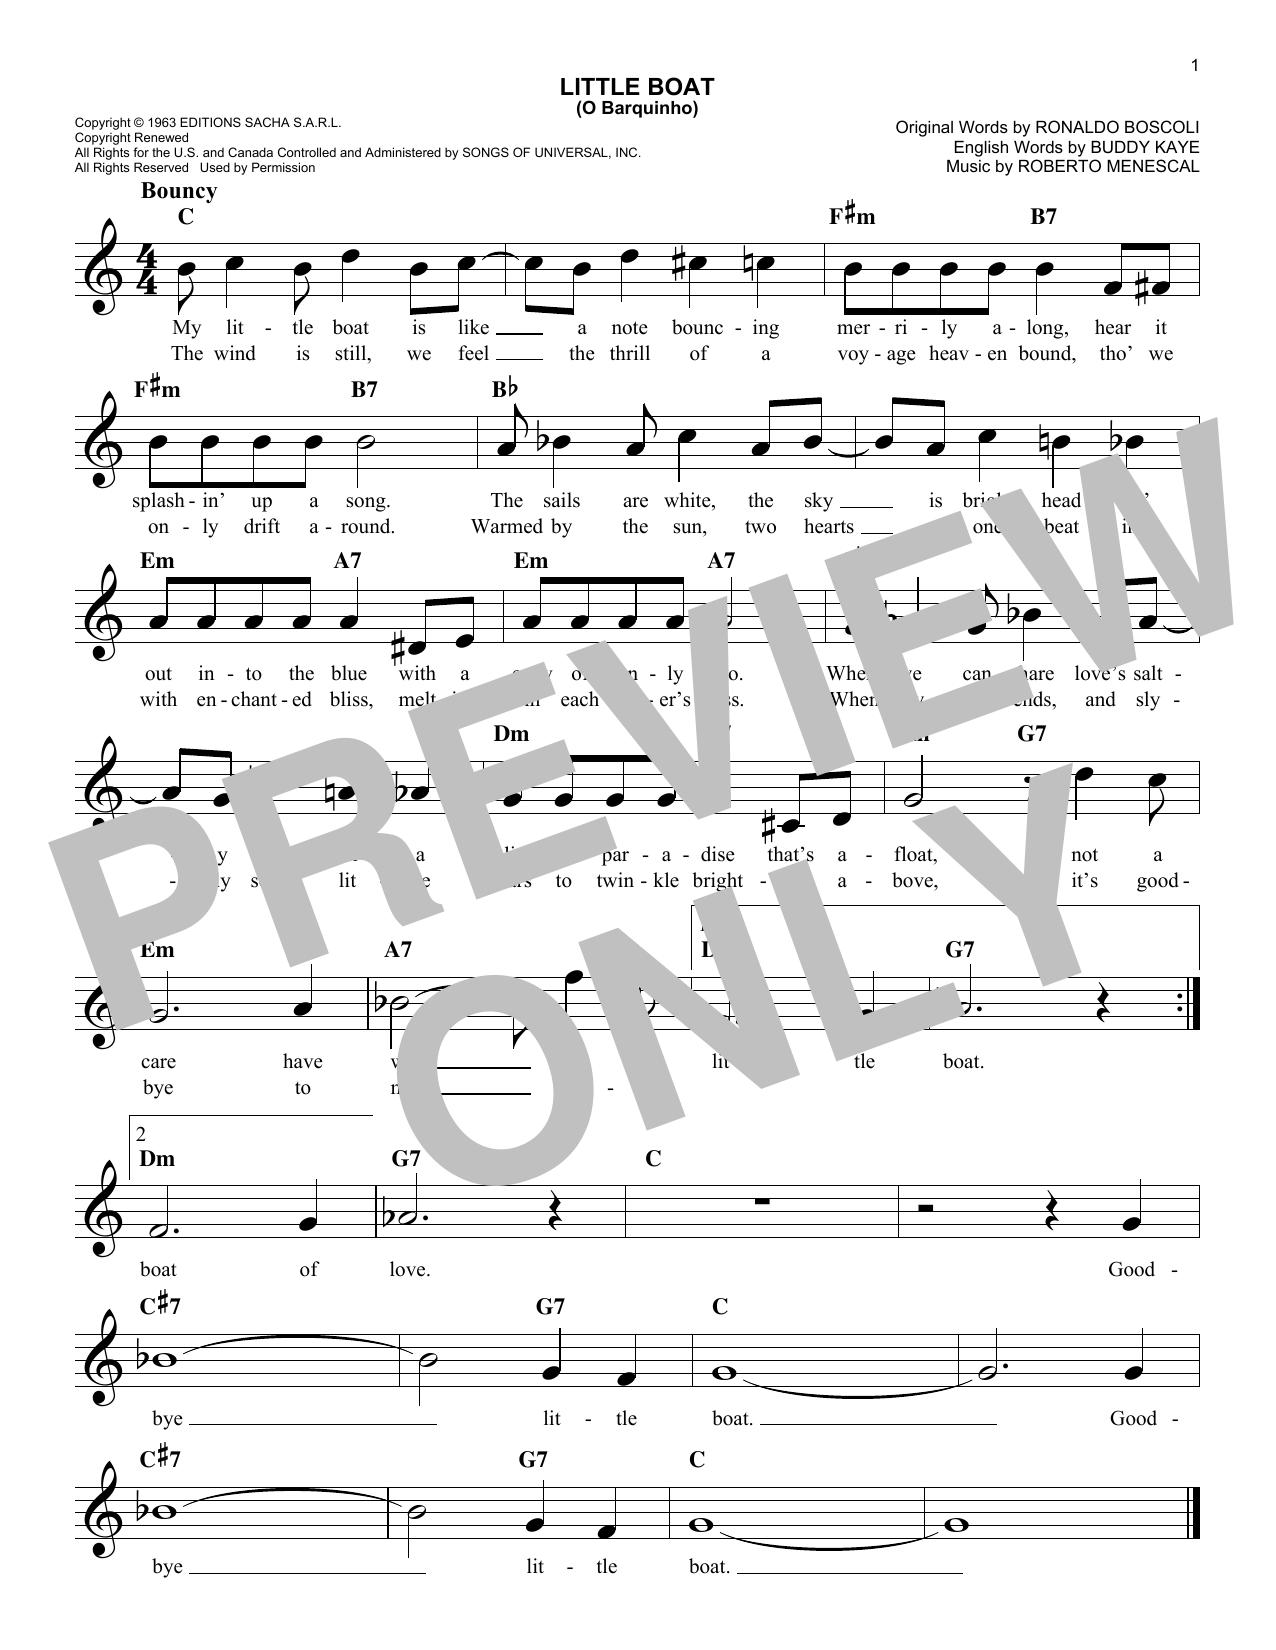 Buddy Kaye Little Boat (O Barquinho) sheet music notes printable PDF score